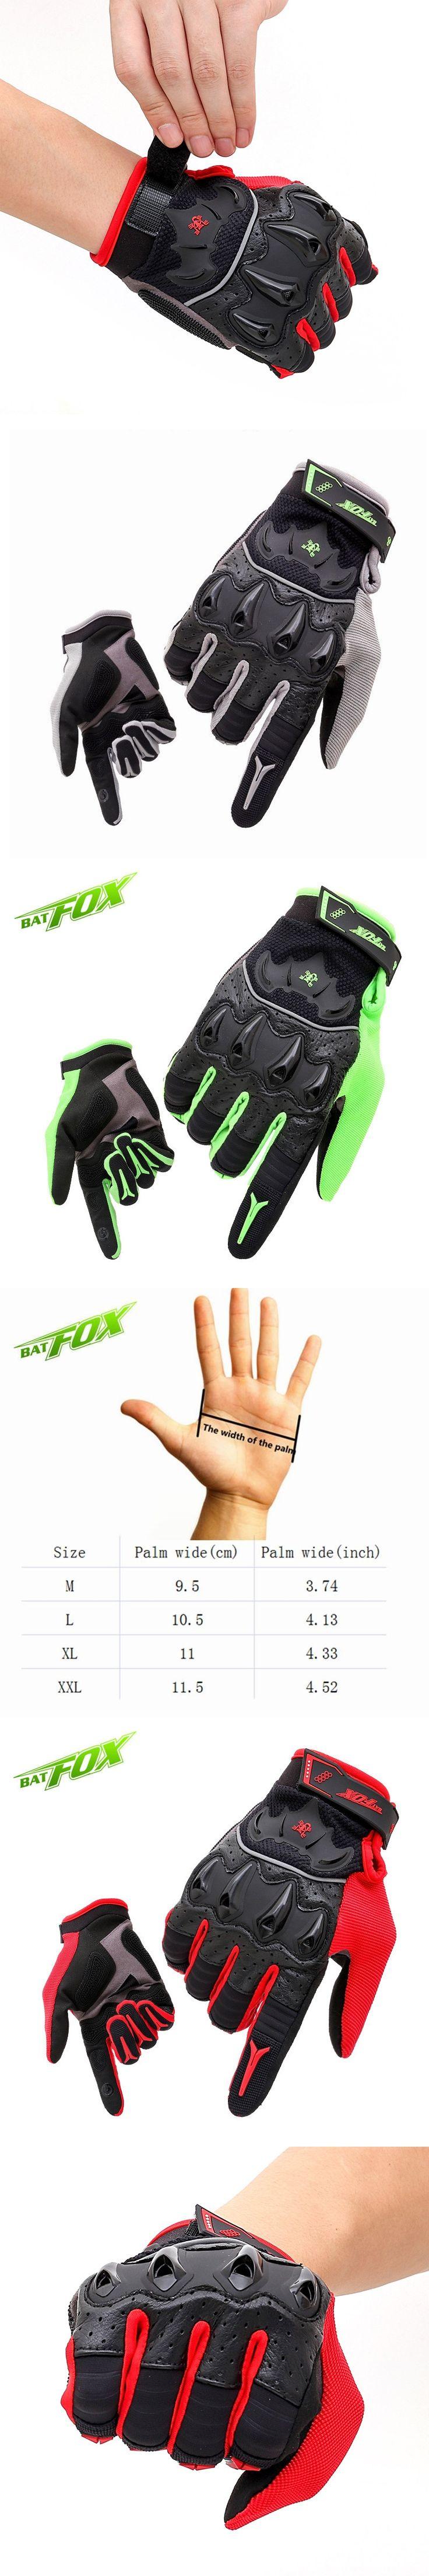 BATFOX 2017 Winter Cycling Gloves Full Finger Gloves Men Women Anti Slip Gel Pad Thermal Warm Motorcycle MTB Road Bike Gloves